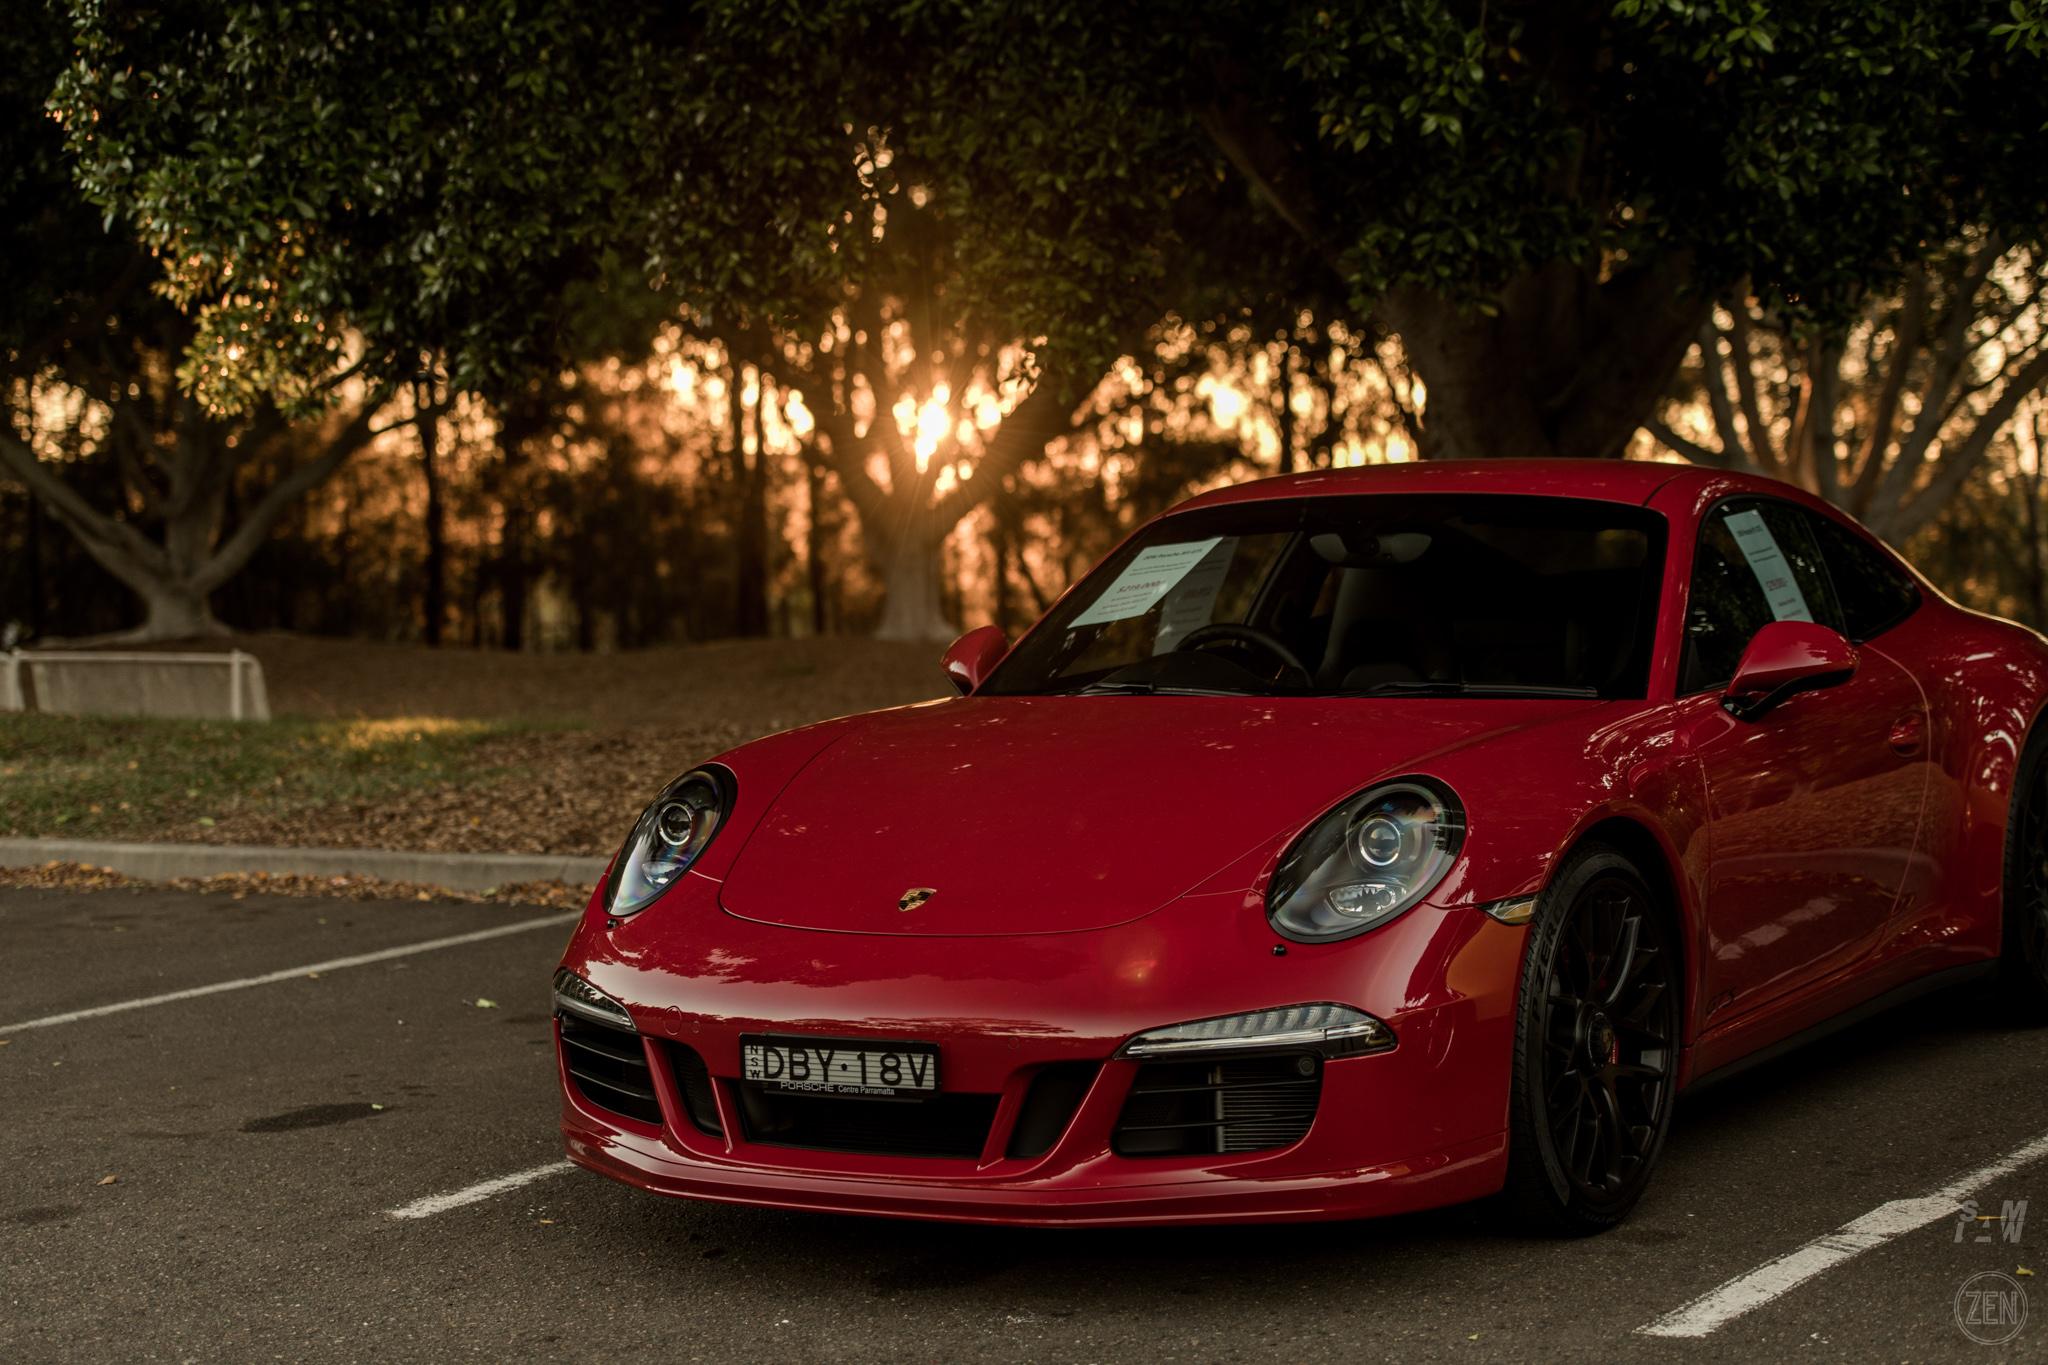 2019-10-27 - Autohaus Porsches & Coffee 005